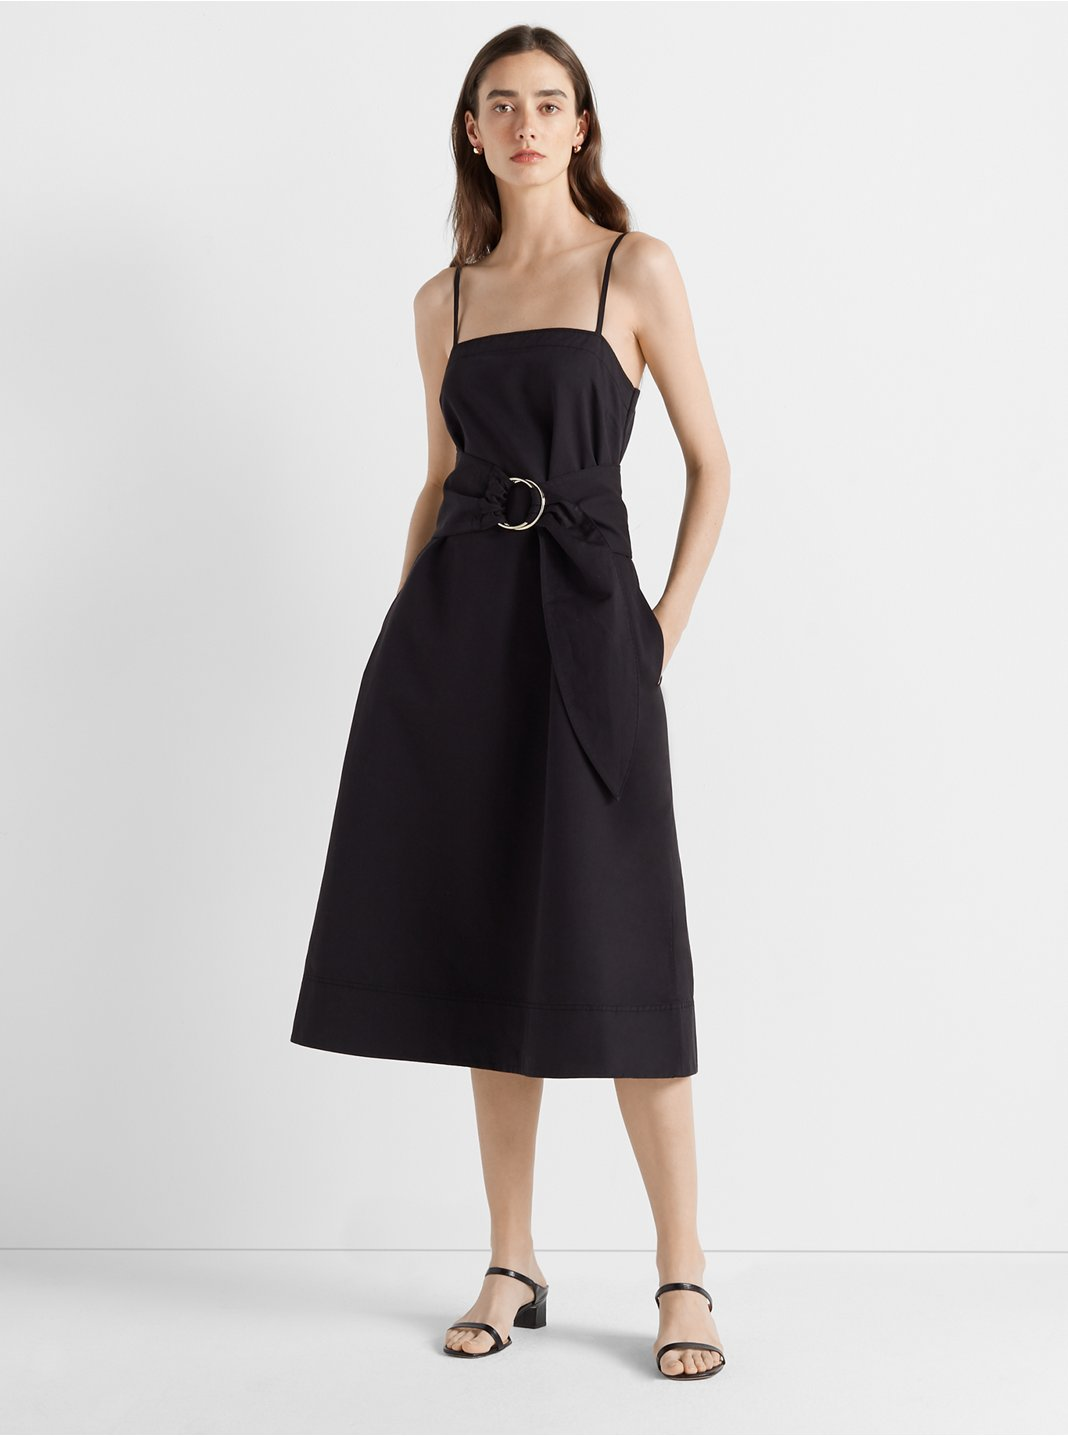 Belted A-Line Dress